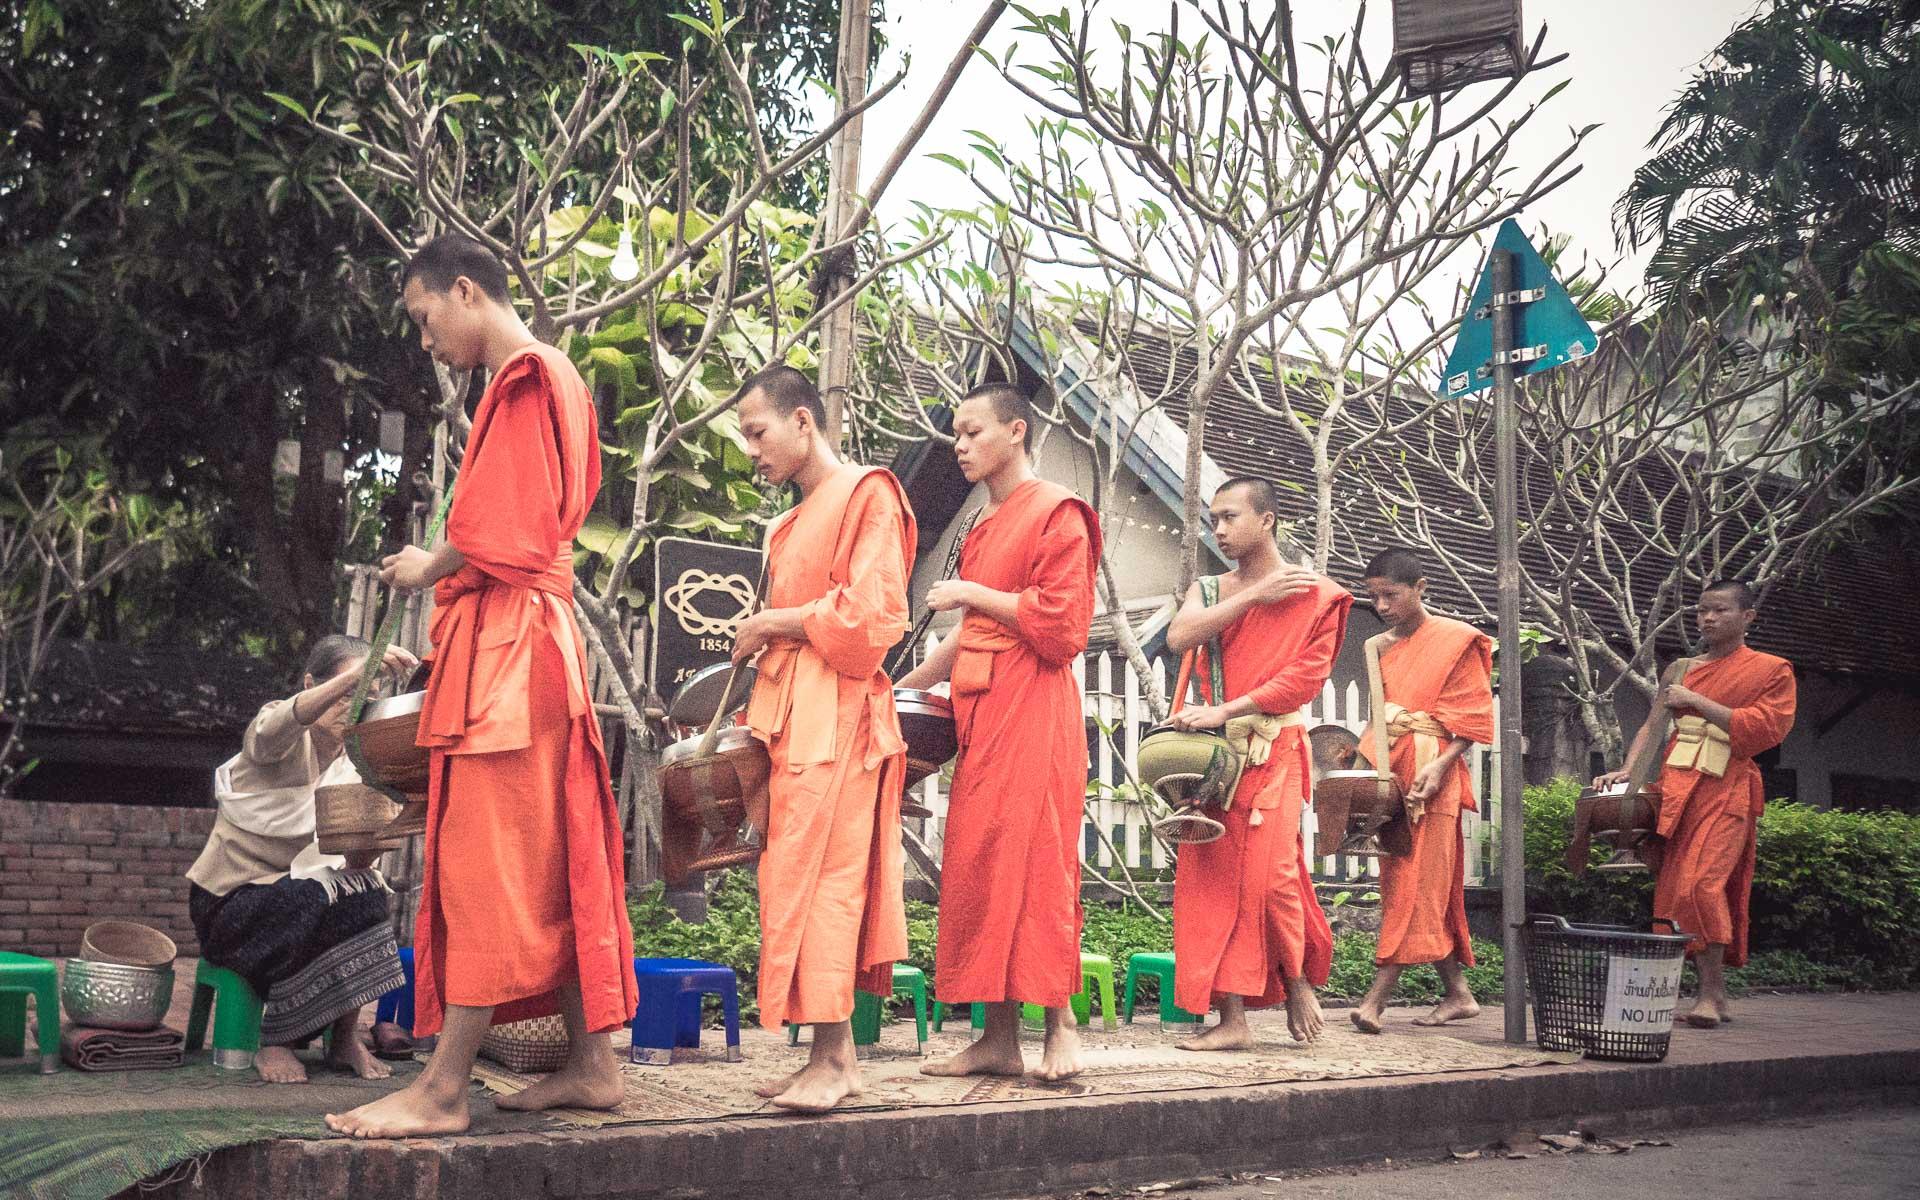 Lesvoyageuses-voyage-laos-luang-prabang-ceremonie-offrandes-16